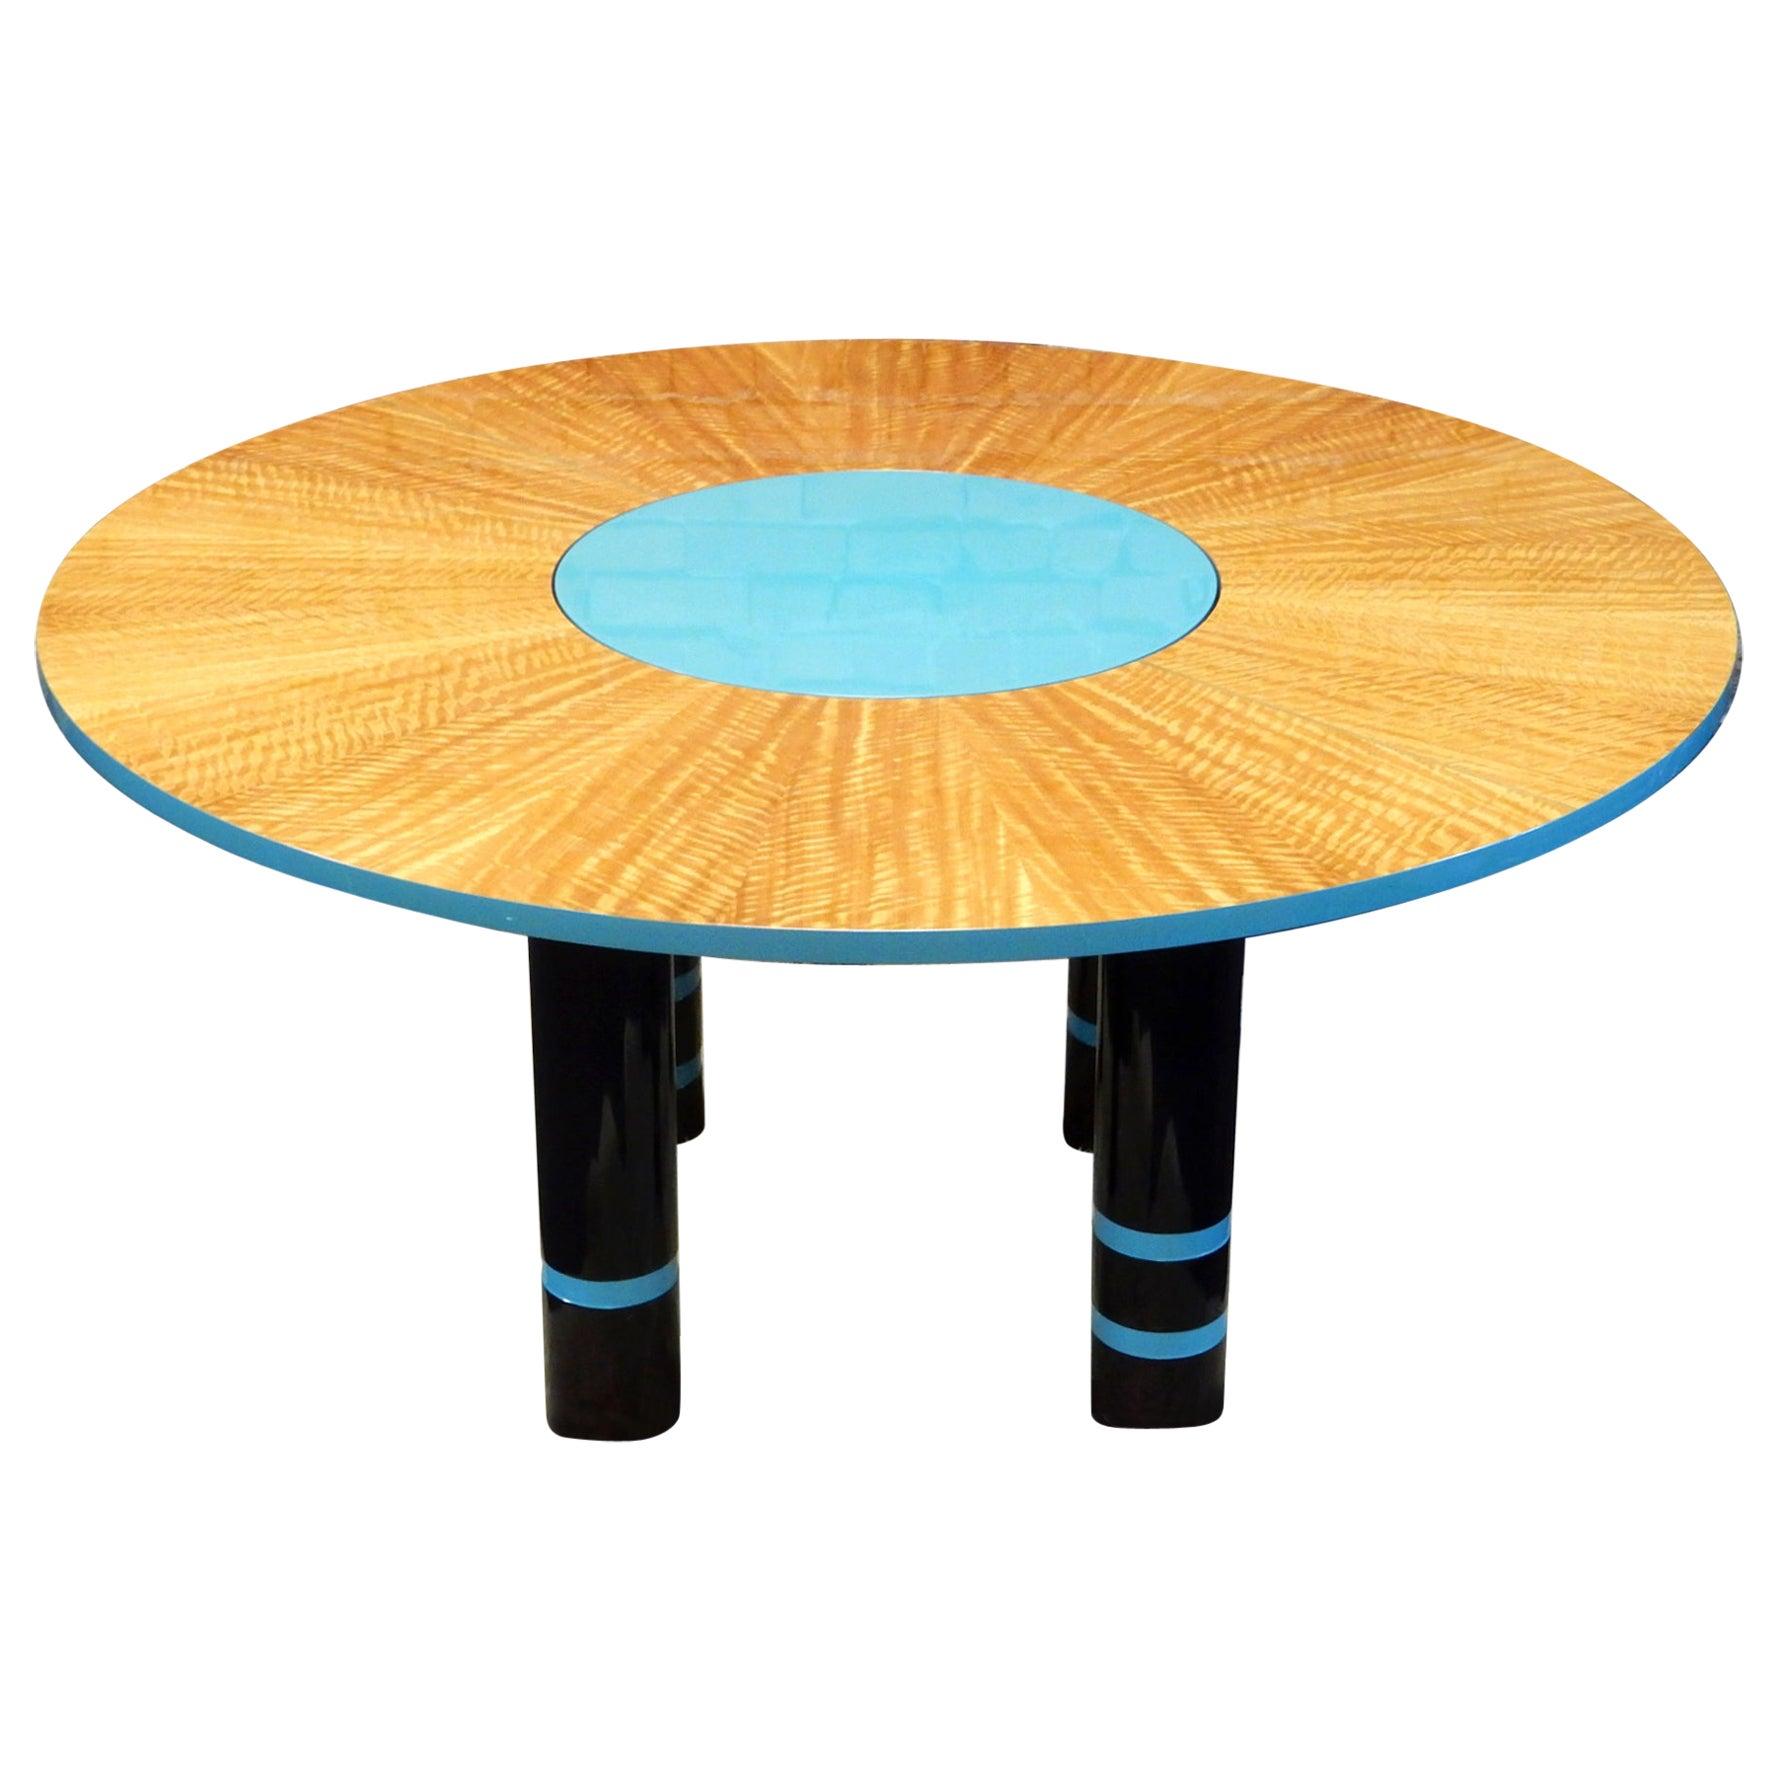 Designer Dakota Jackson Postmodern Exotic Wood Dining Table